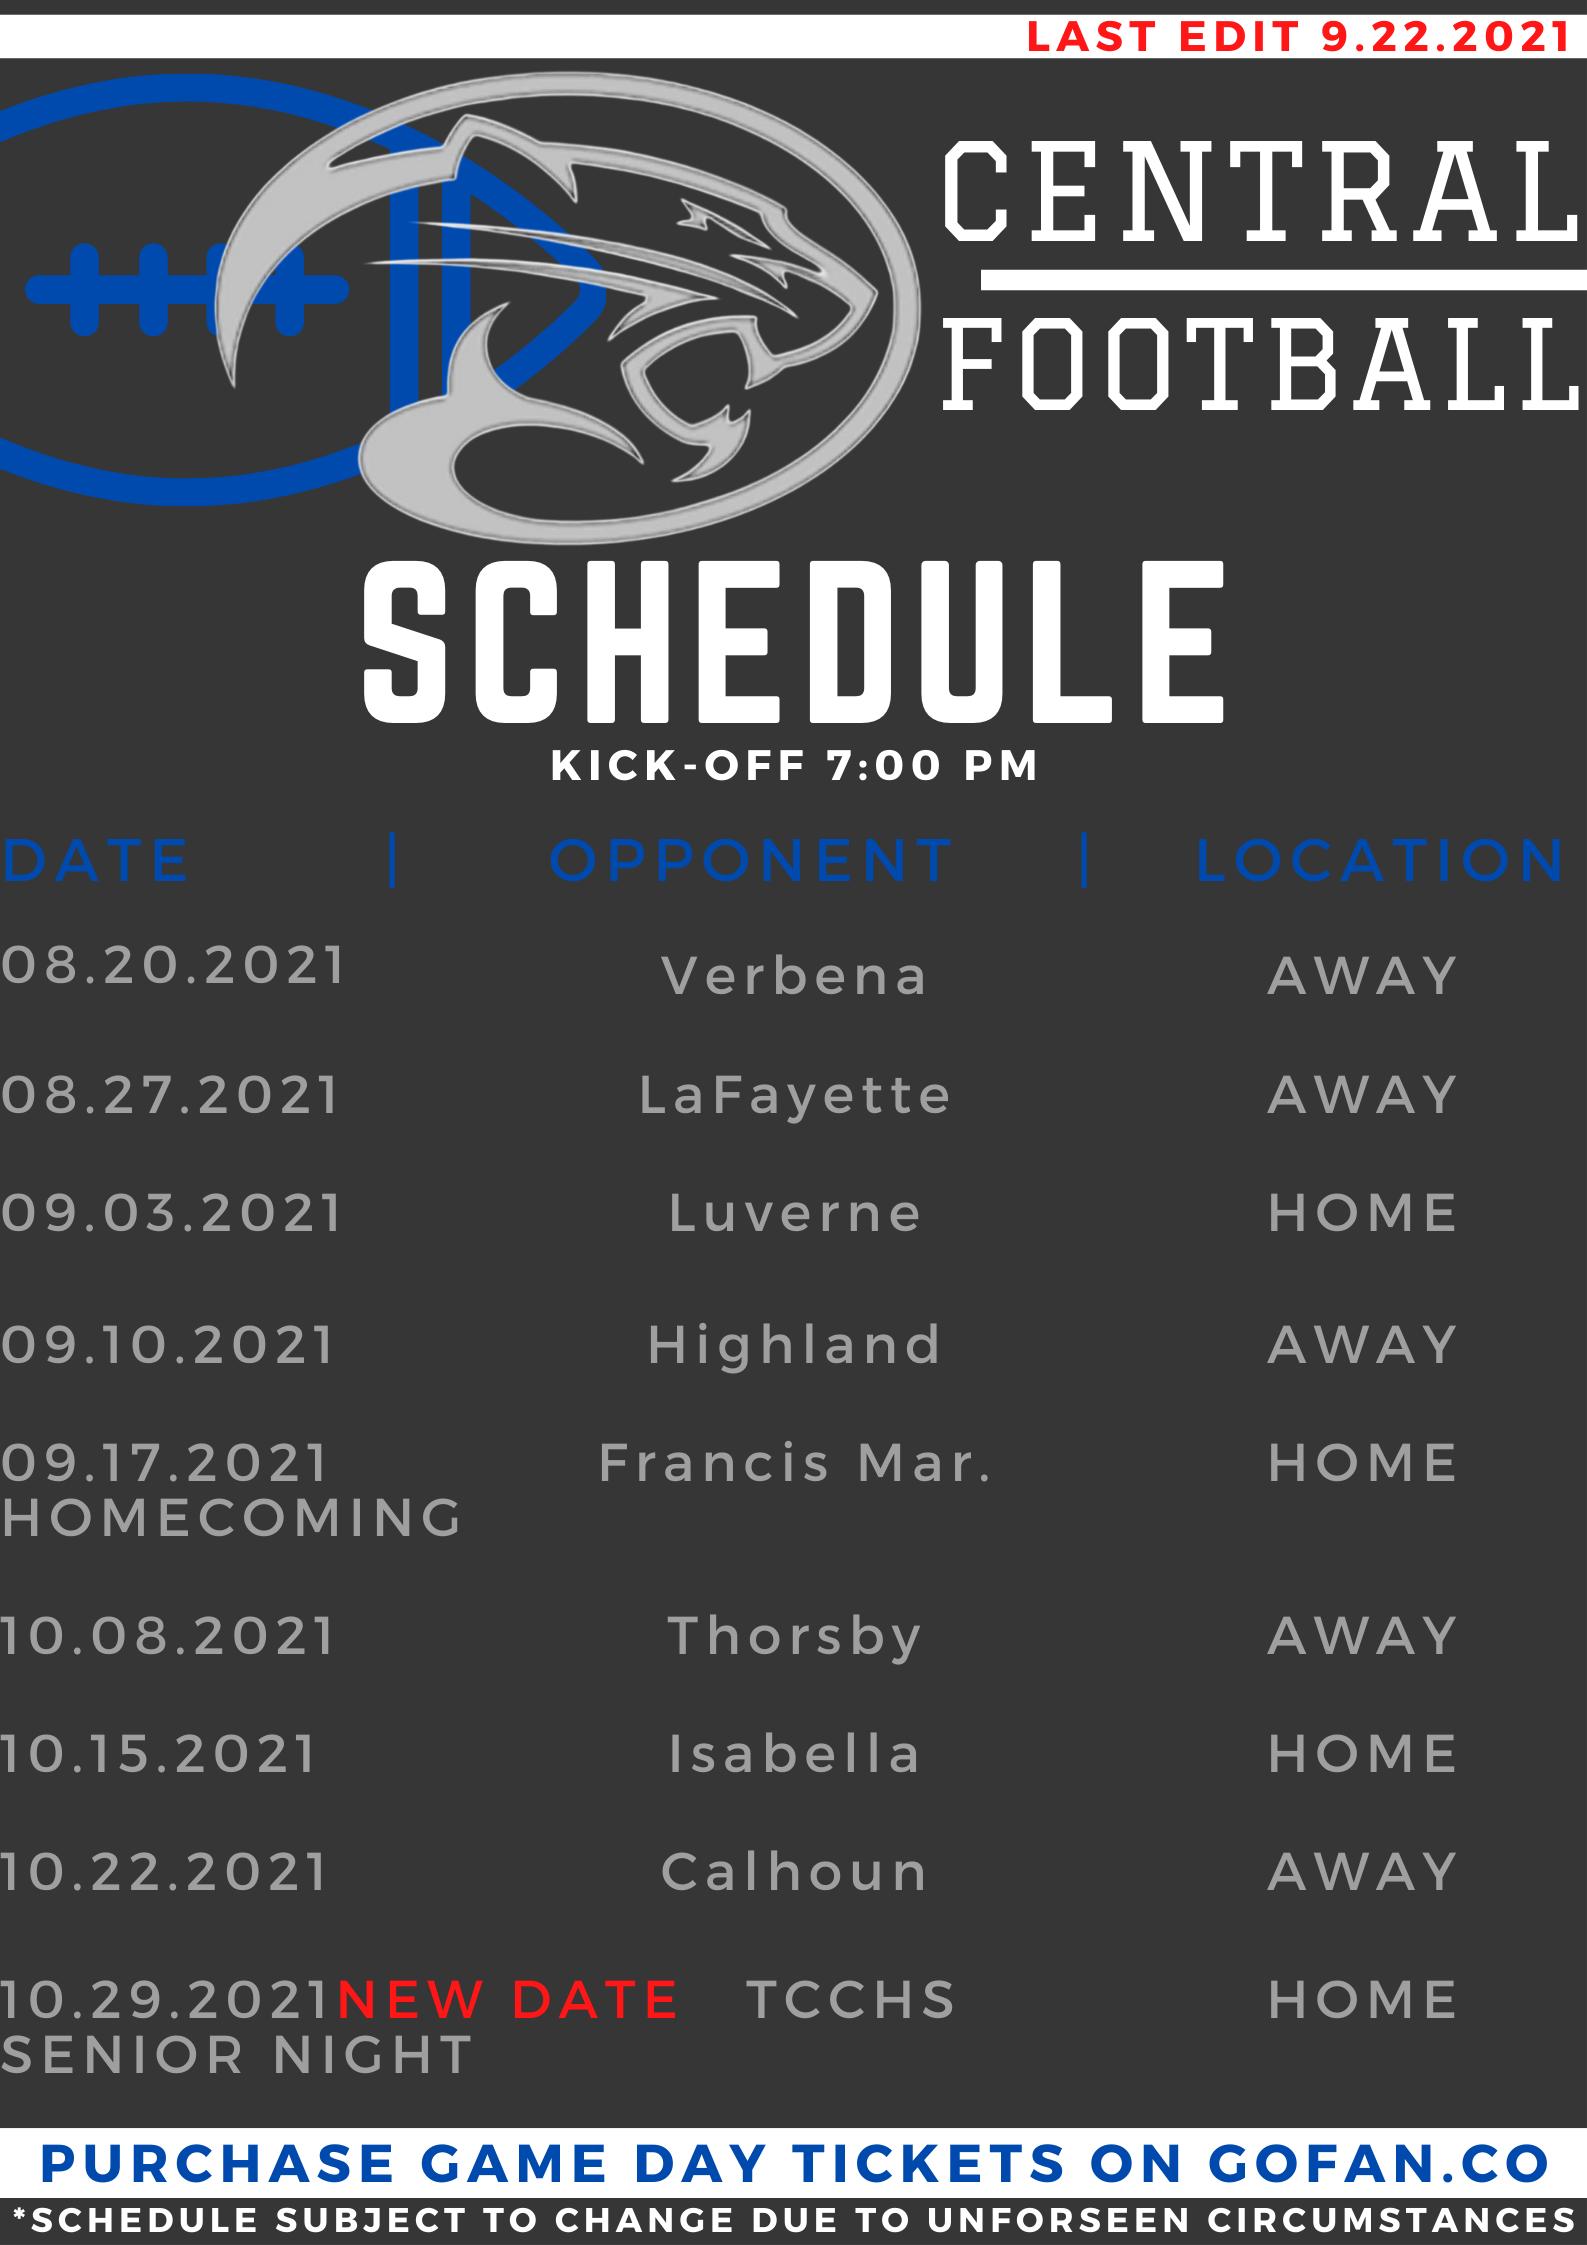 2021 Football Schedule GIF